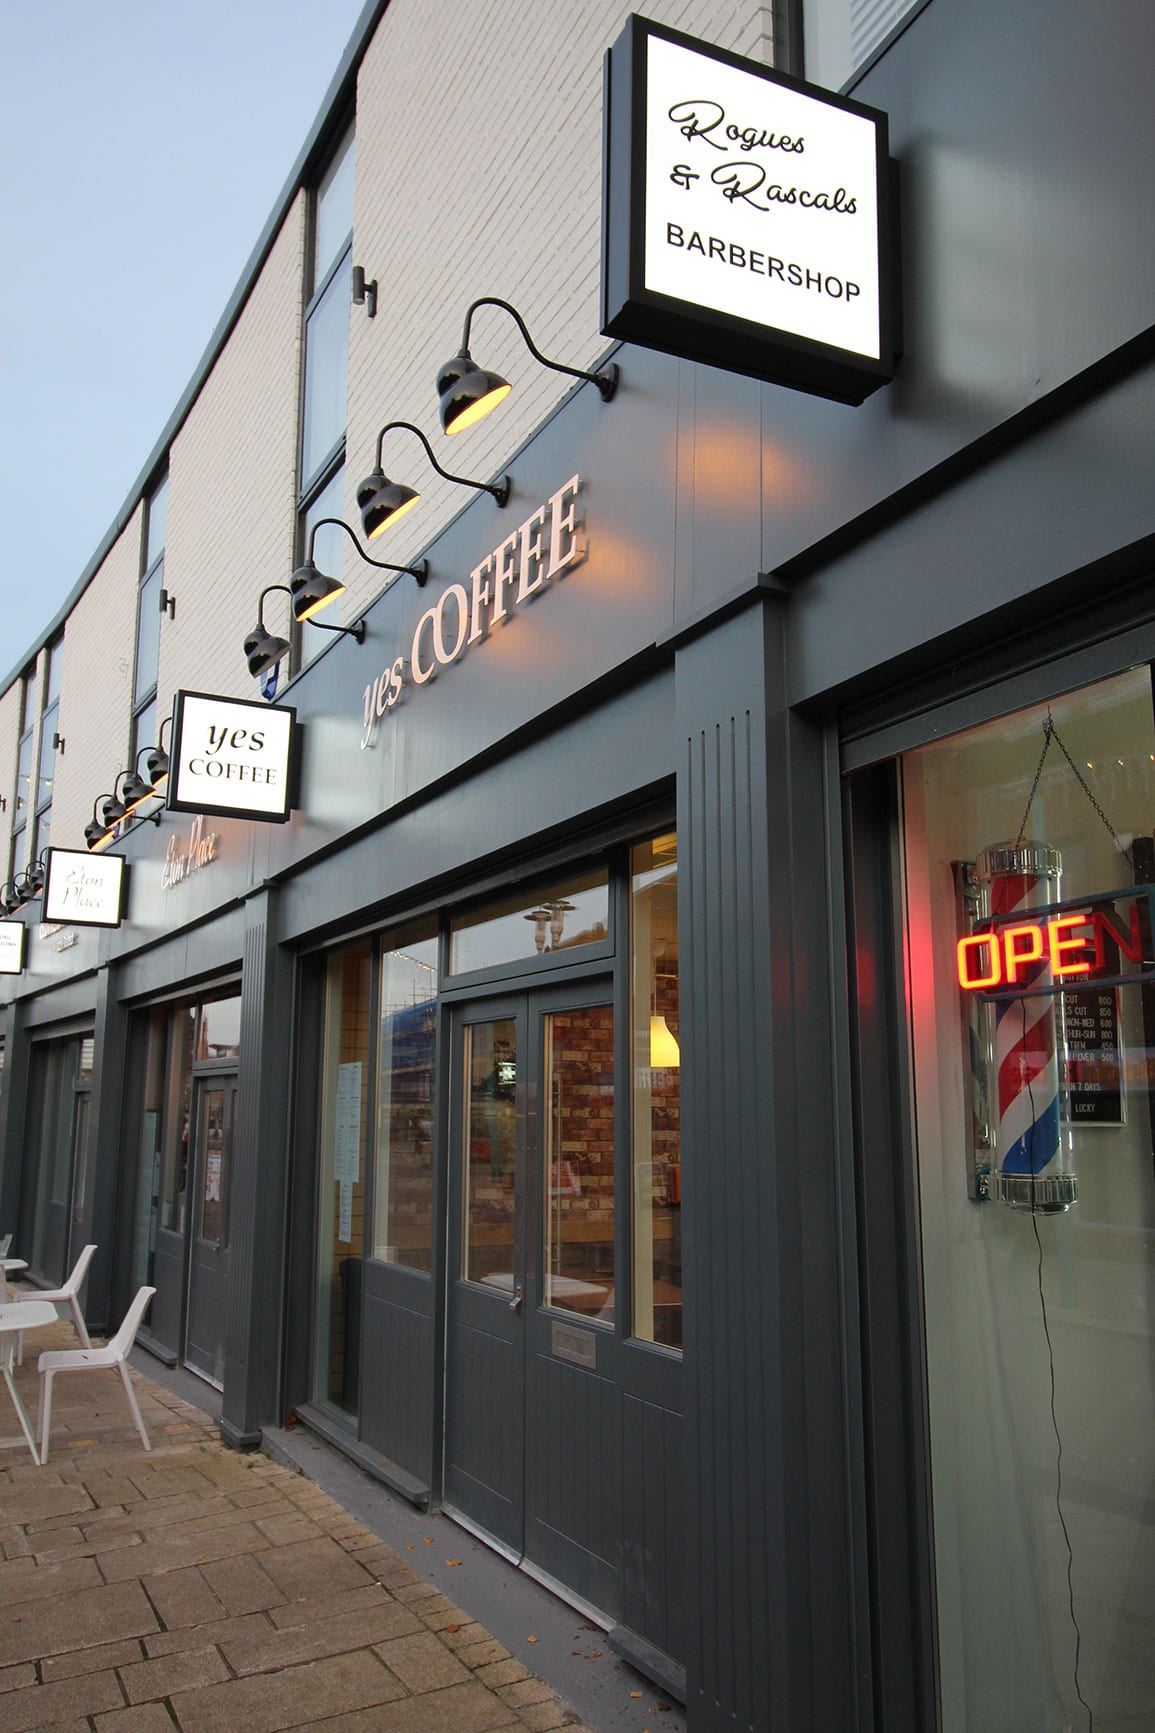 Knowsley Huyton Village Shop Front Architectural Emporium High Street Regeneration